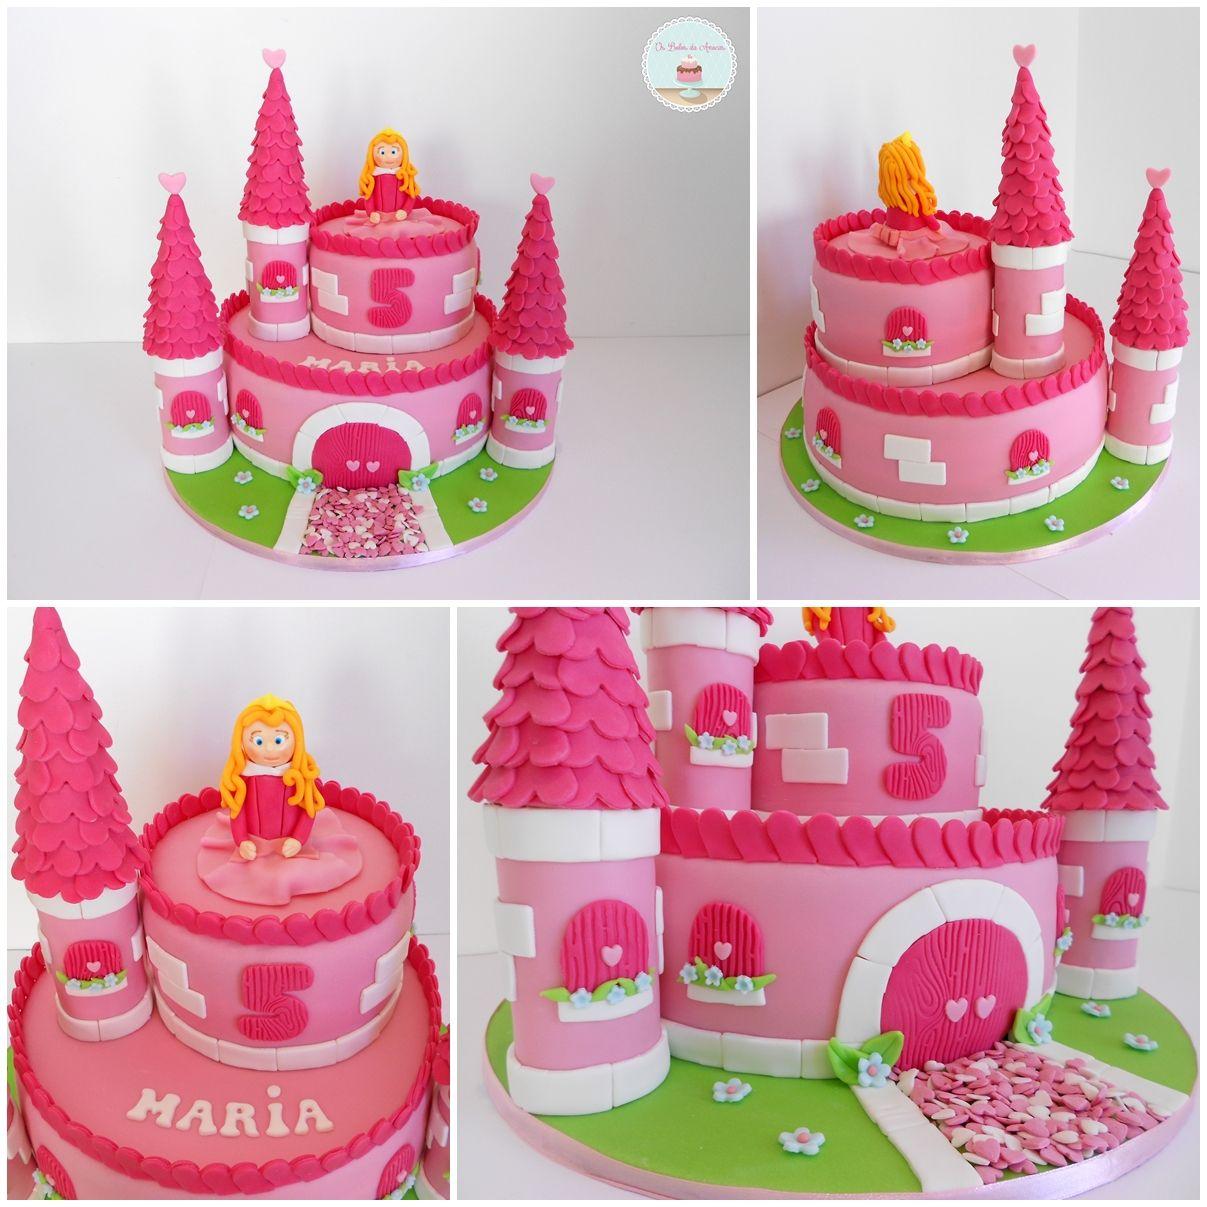 Princess Aurora Cake Design : Princess Aurora Cake CAKE Pinterest